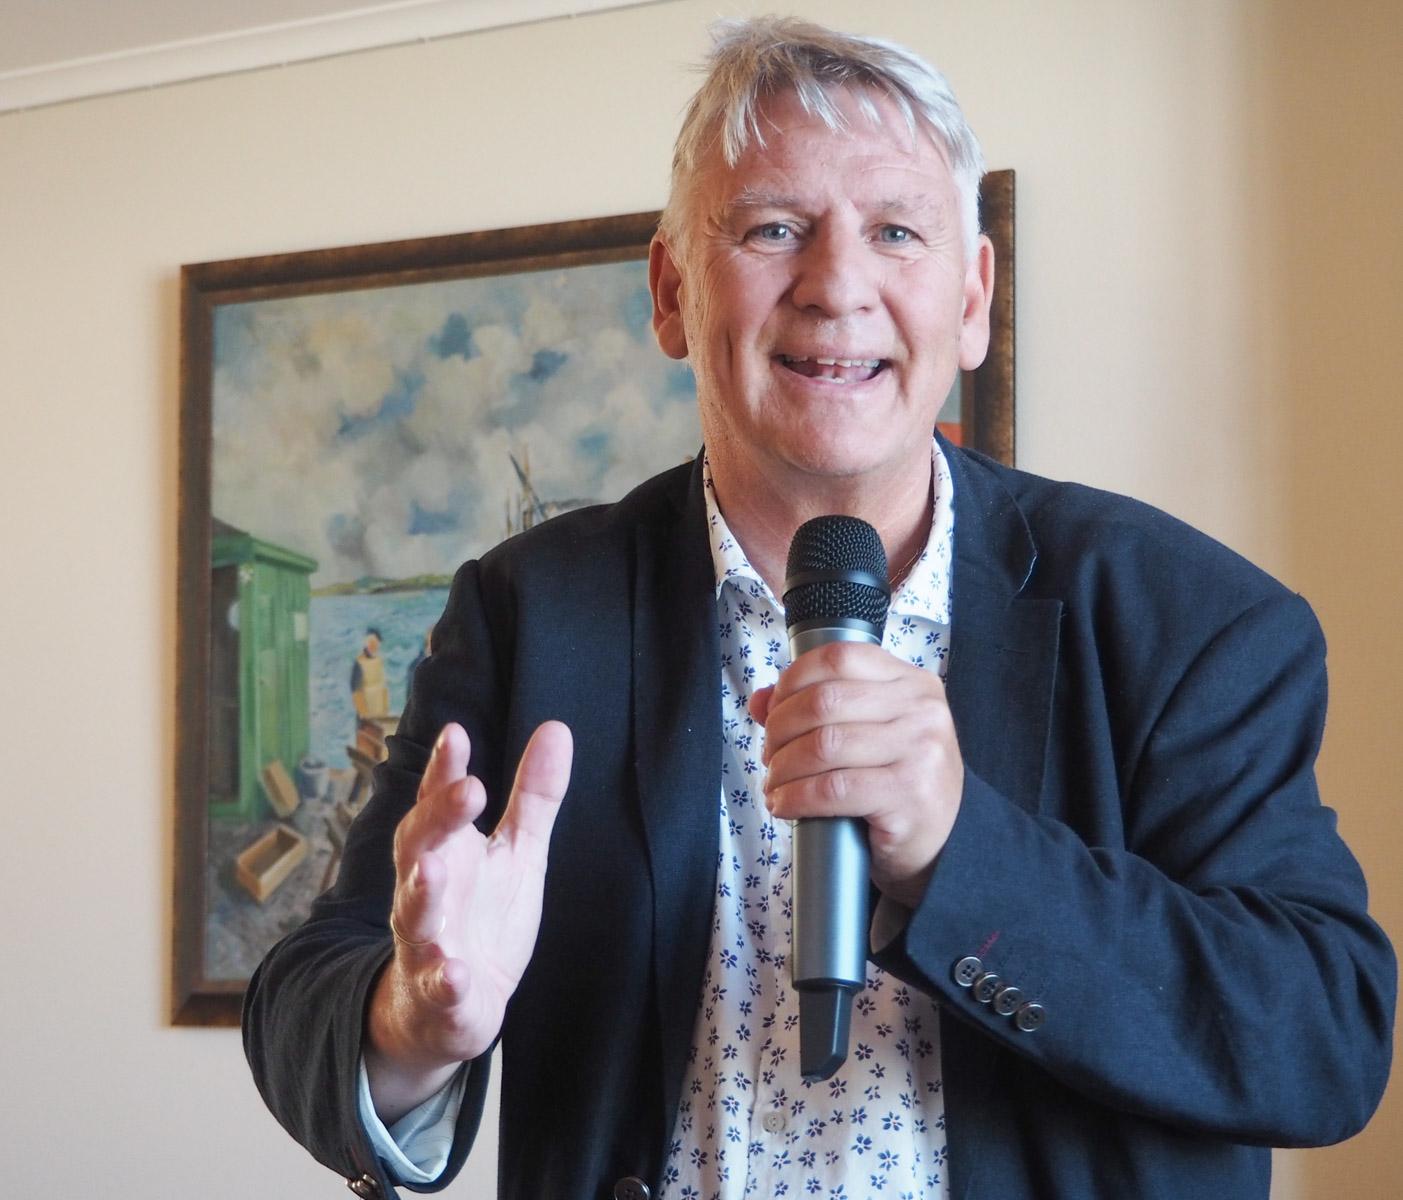 Rolf Jan Aarstad